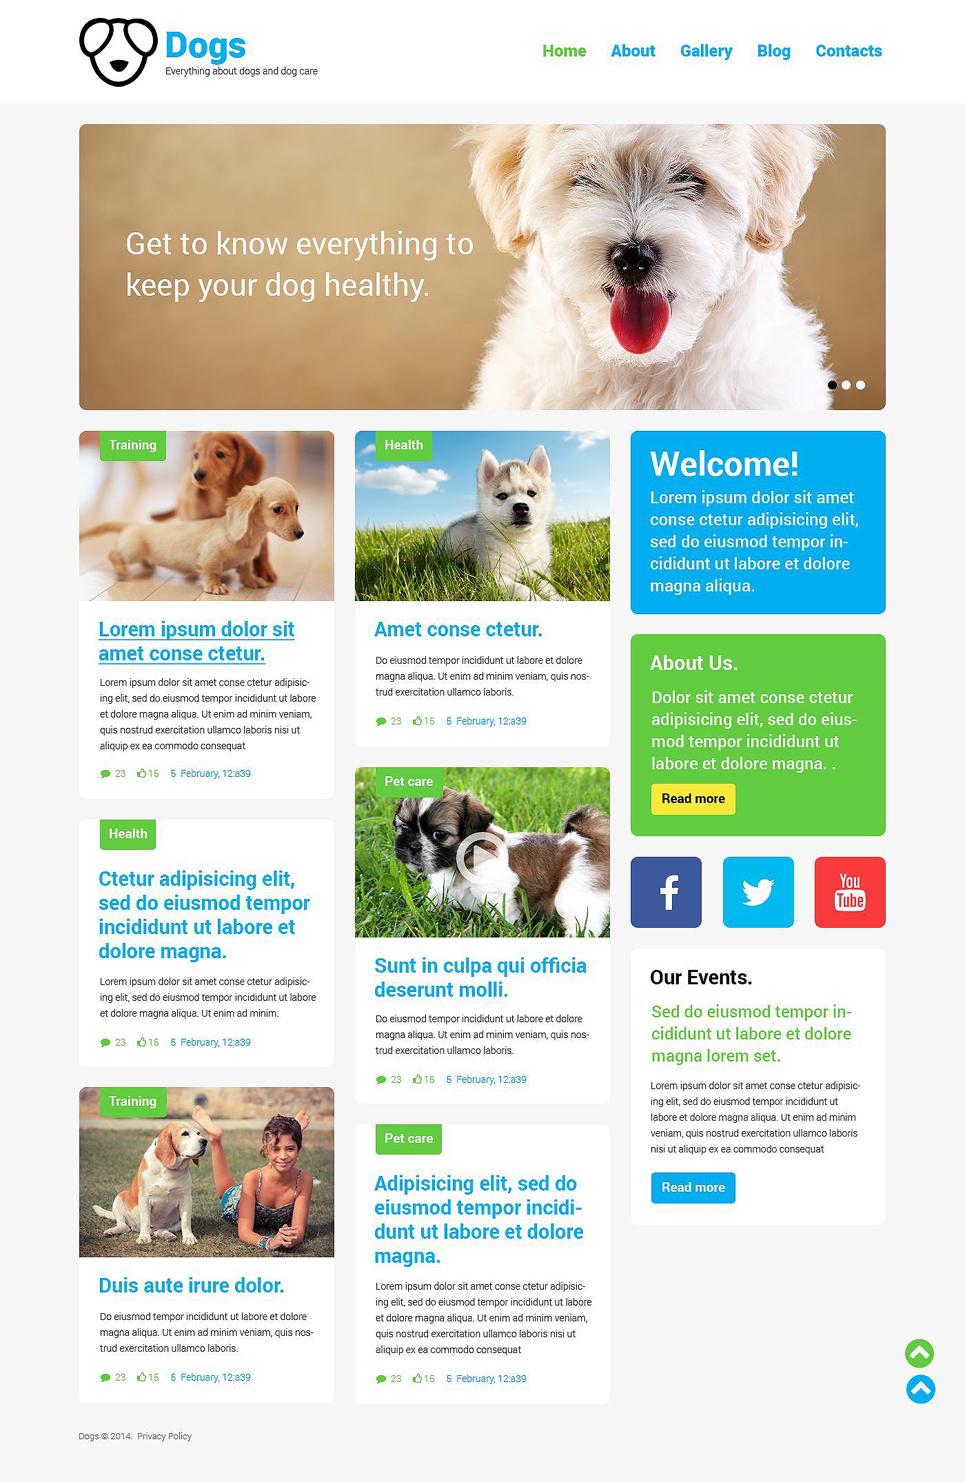 Адаптивный шаблон сайта на тему собаки #52170